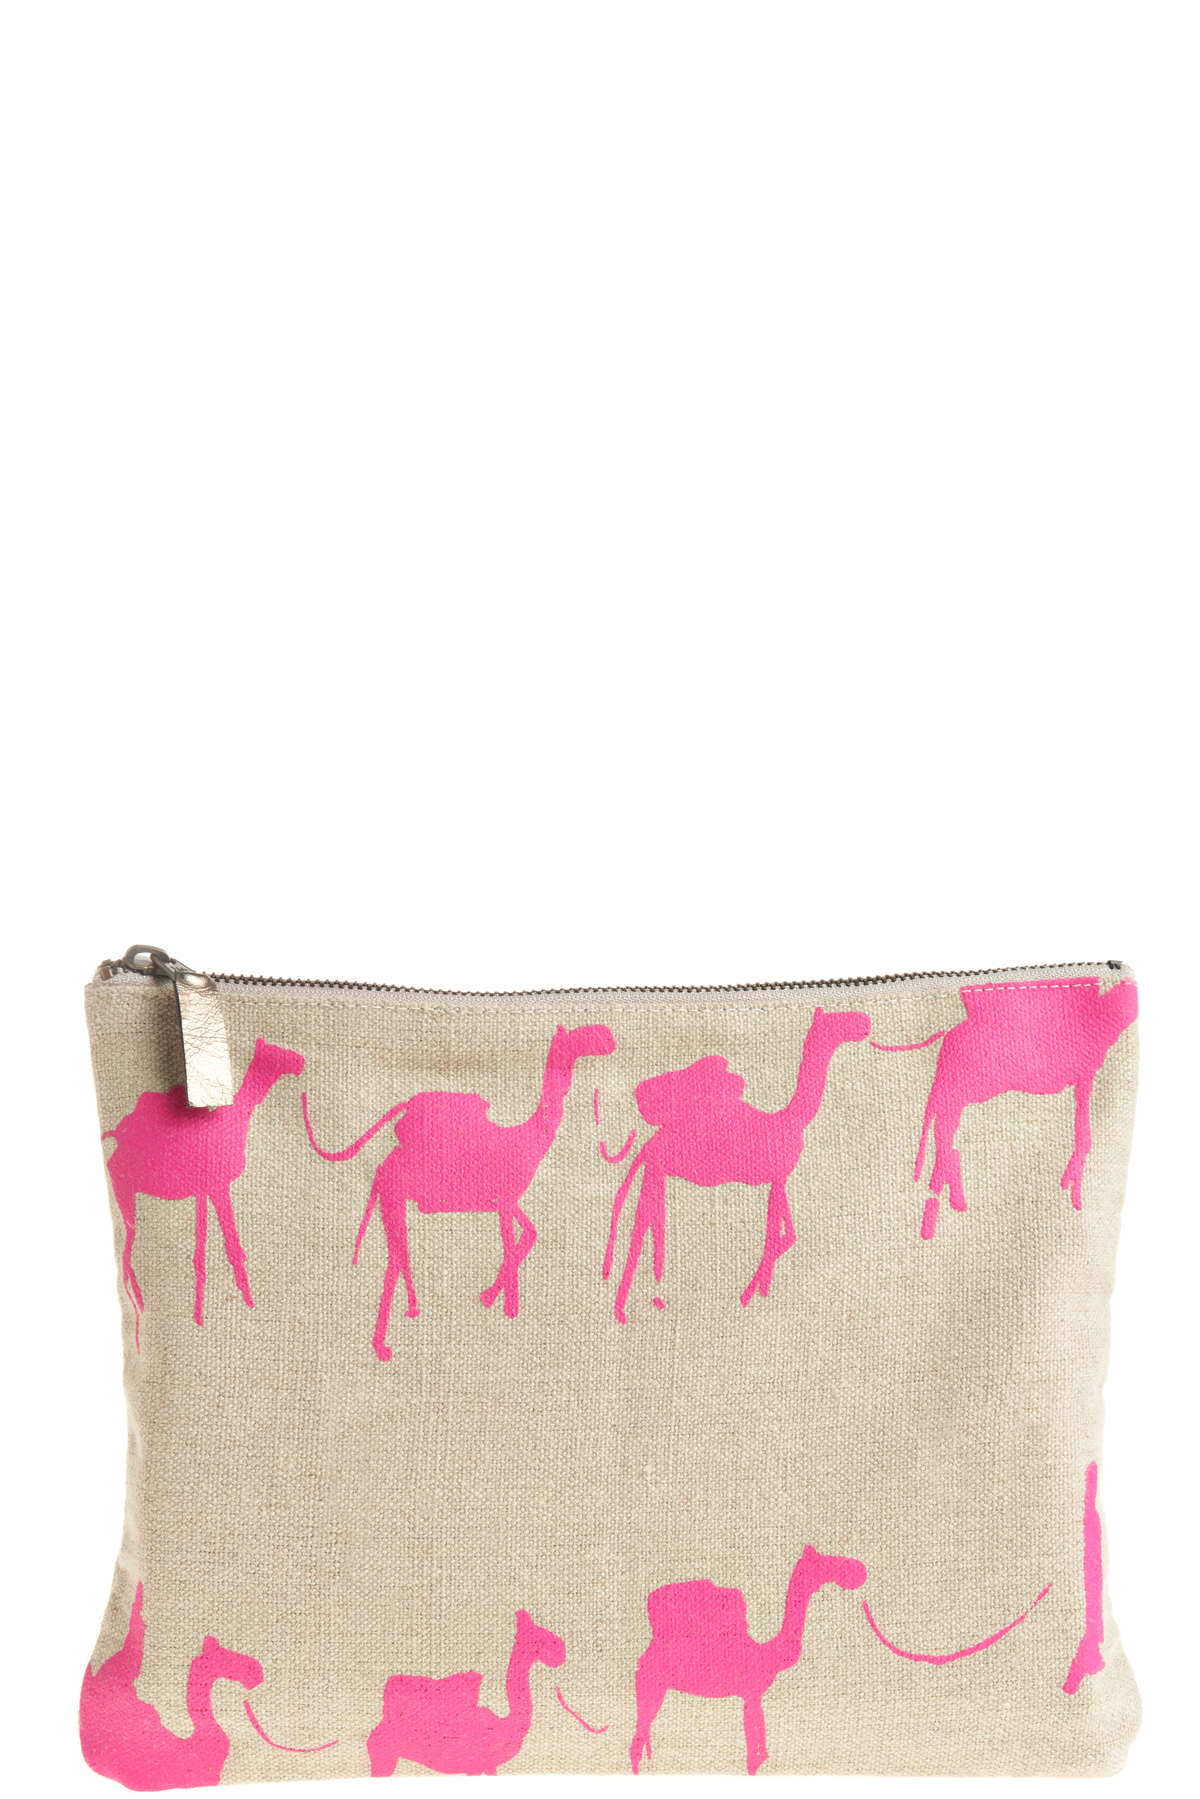 Camel Case by Calypso St. Barth